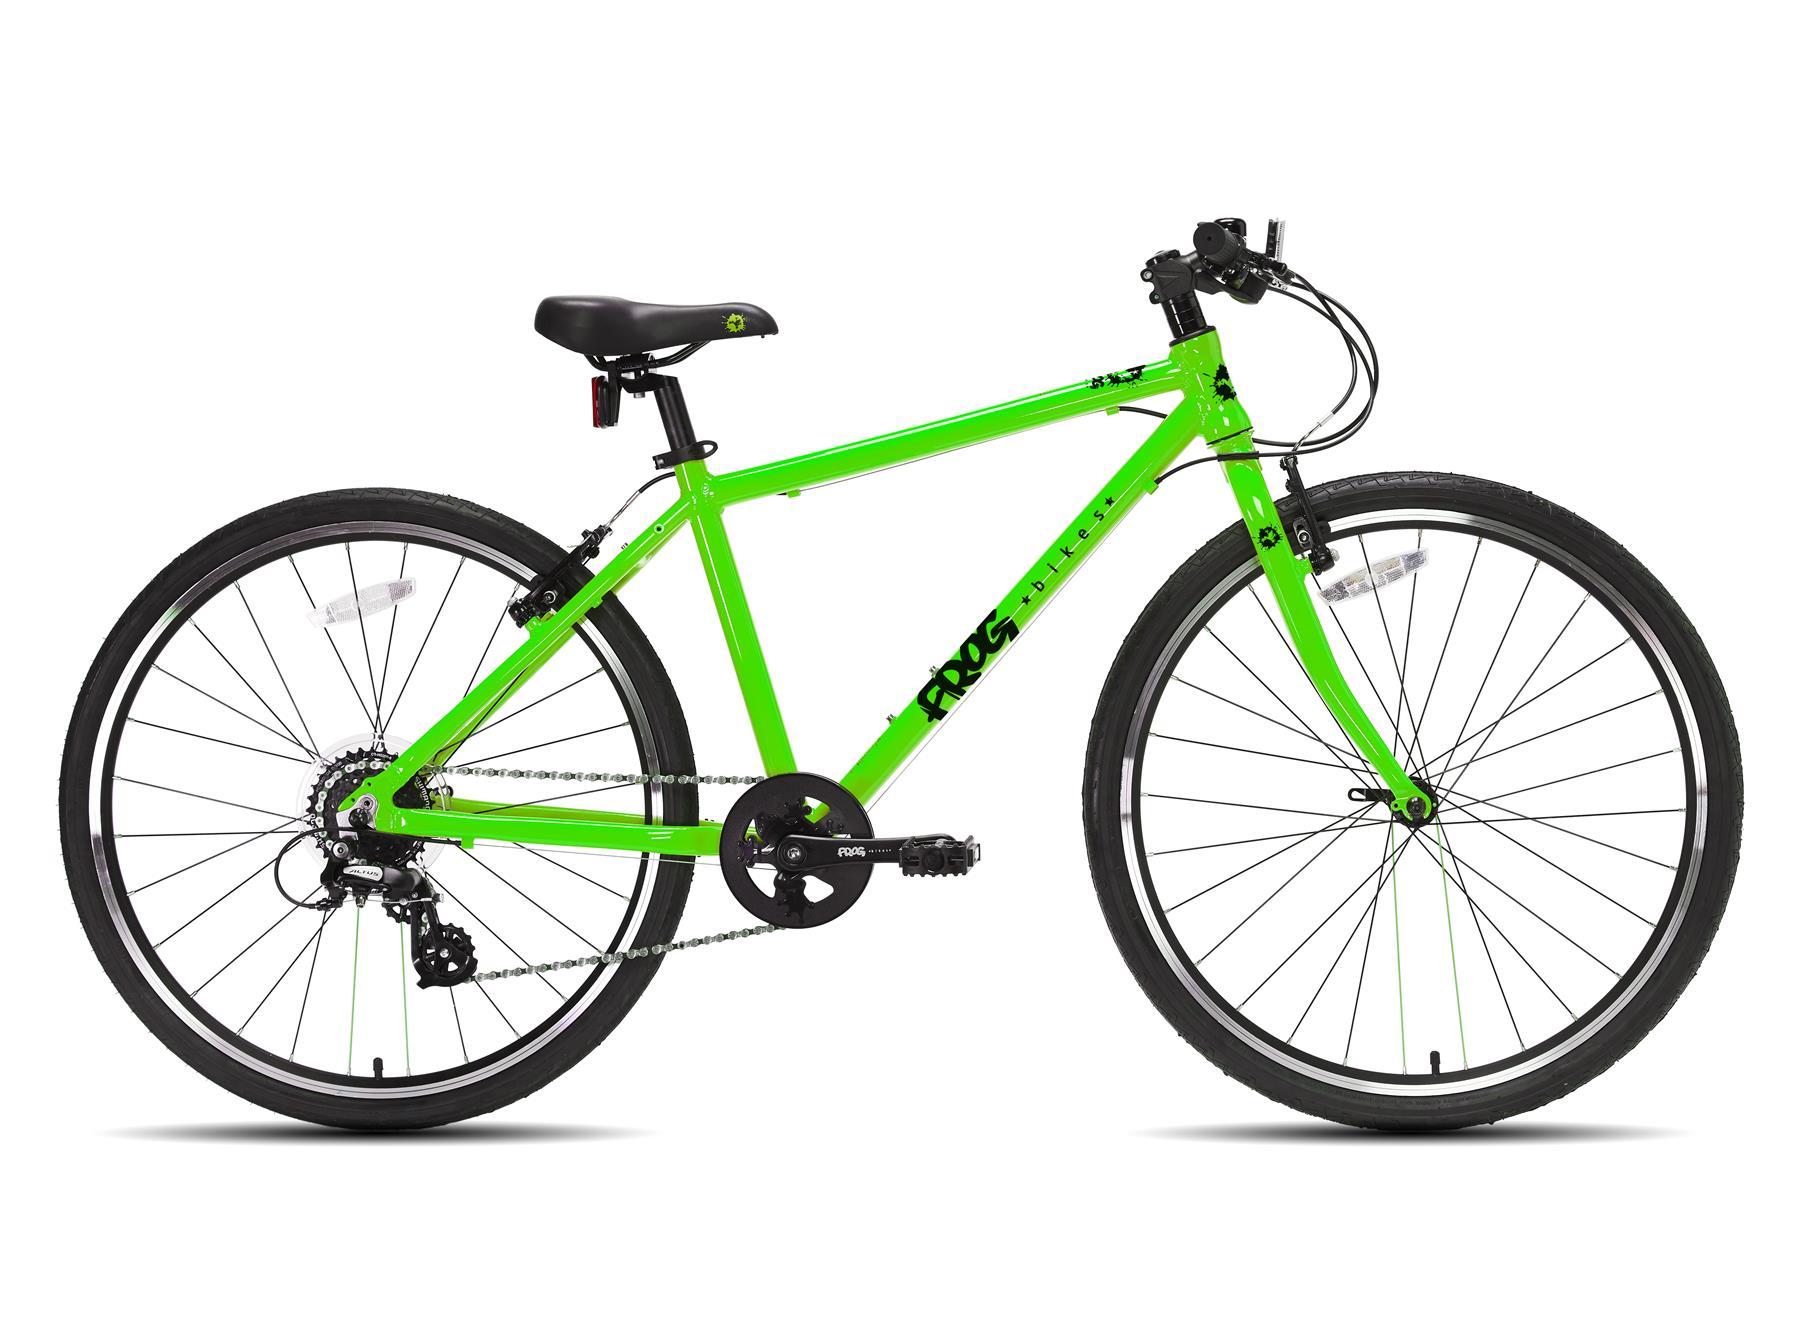 Frog Bikes 73 - Green